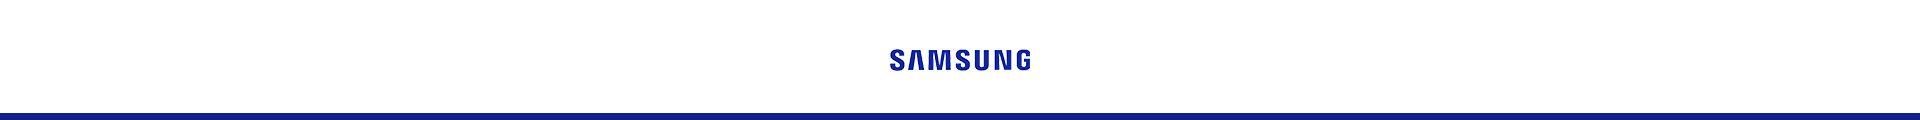 brand-samsungline- Phụ Kiện Pico  Khuyến mại 12-12-2020